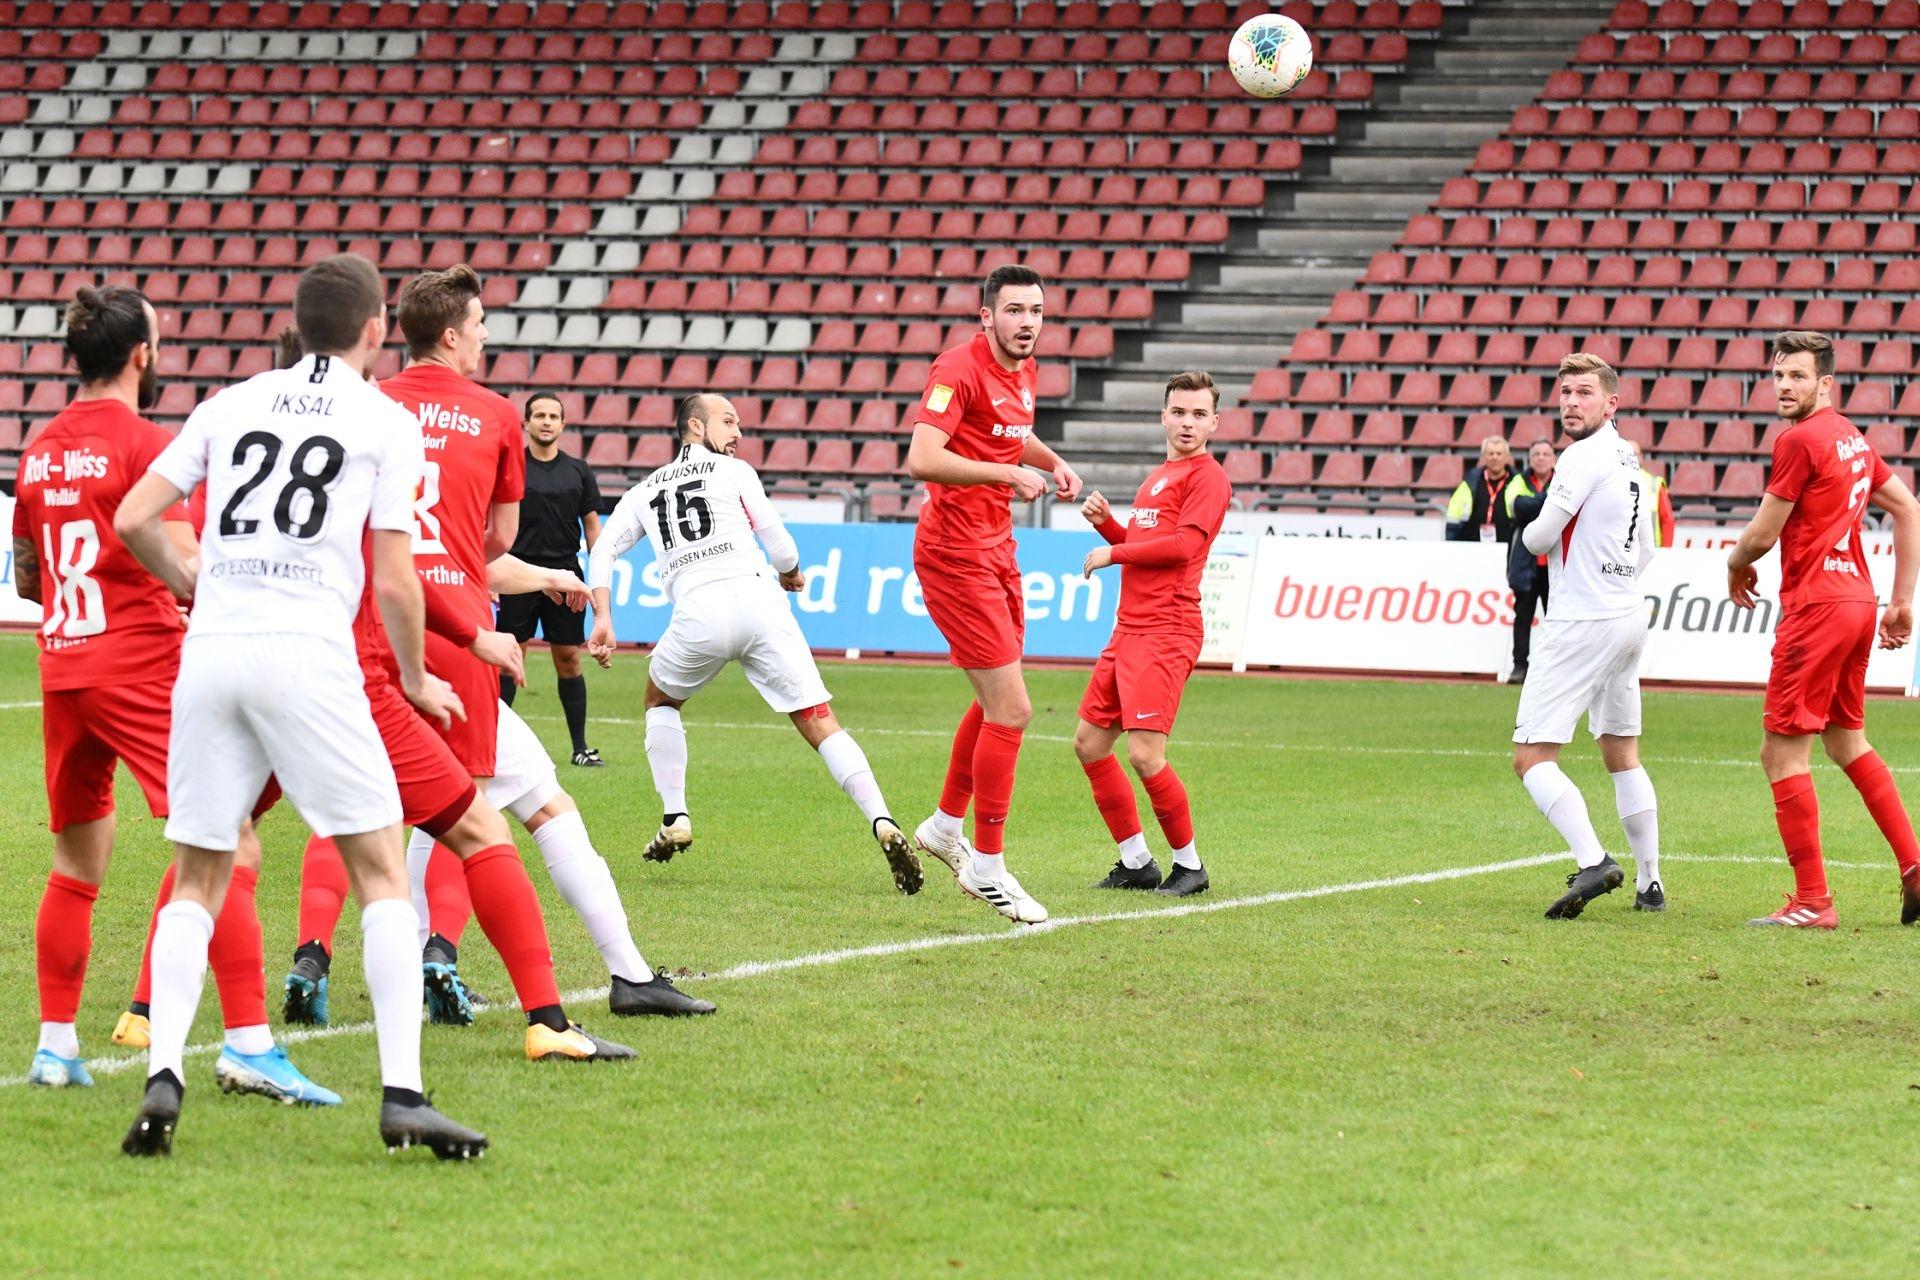 KSV Hessen Kassel, Rot-Weiss Walldorf, Endstand 4:0, Lukas Iksal (KSV Hessen Kassel), Sergej Evljuskin (KSV Hessen Kassel), Sebastian Schmeer (KSV Hessen Kassel)